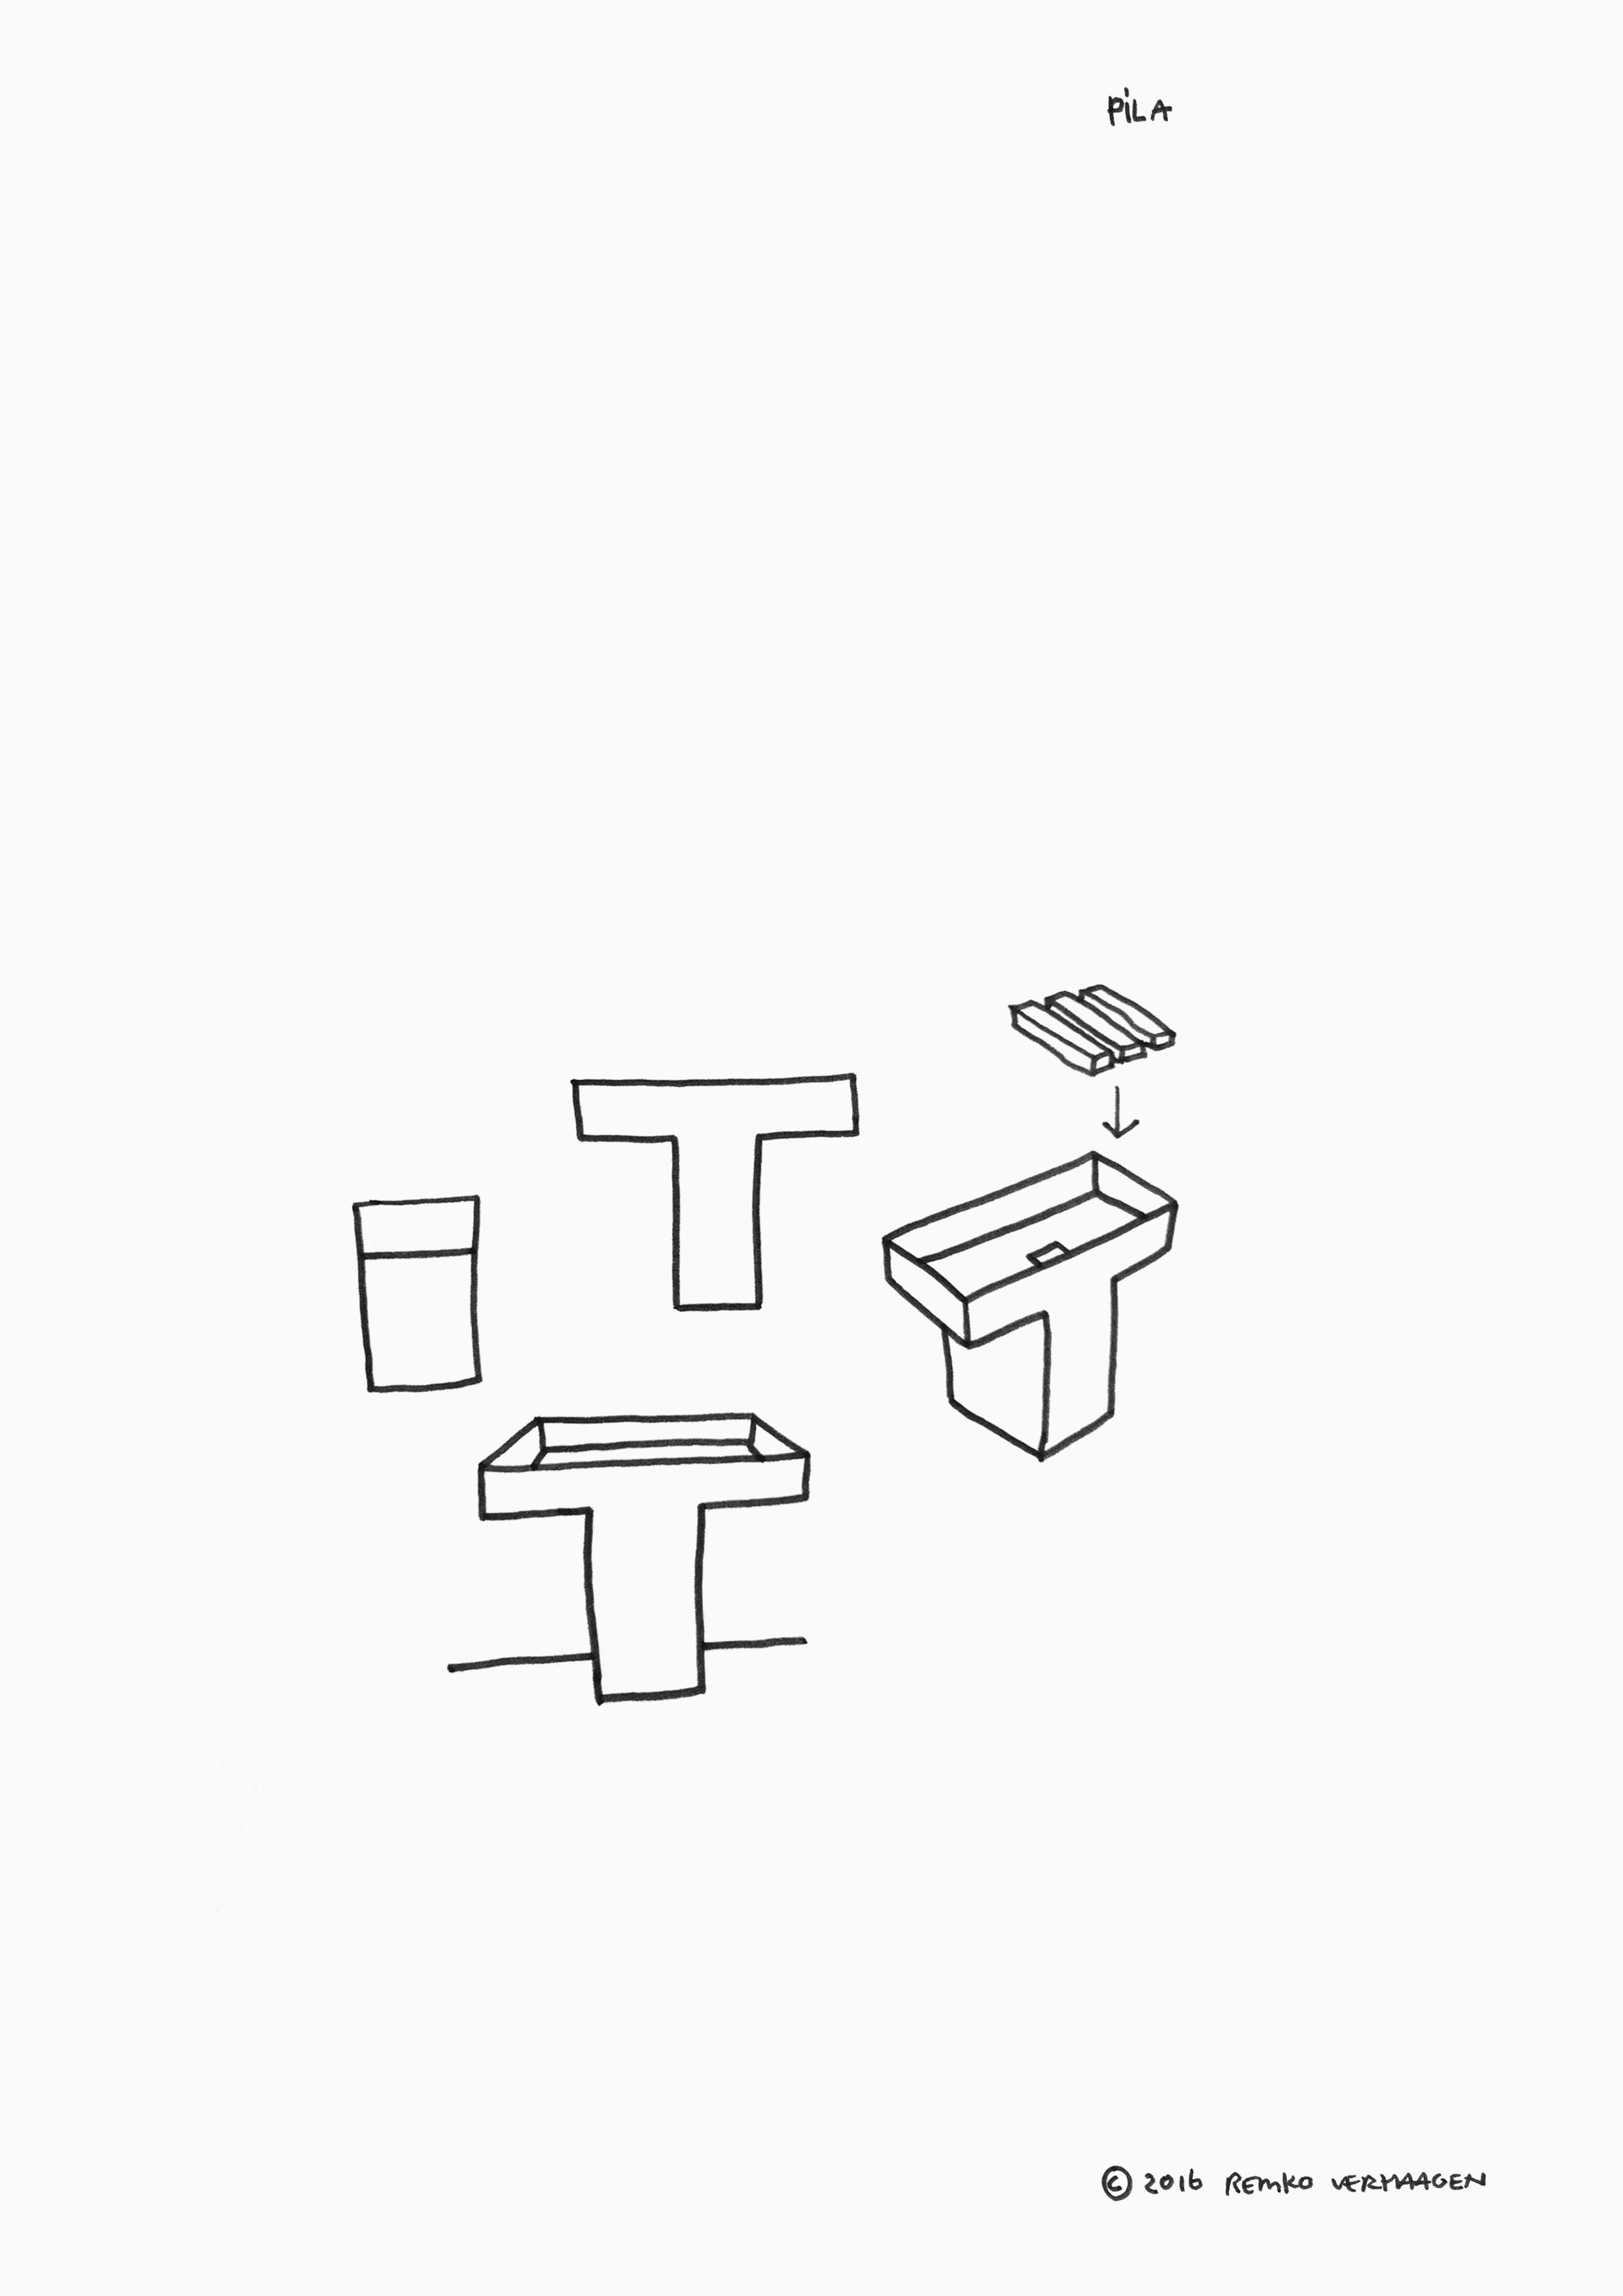 Sketch  / Pila ideation doodle.